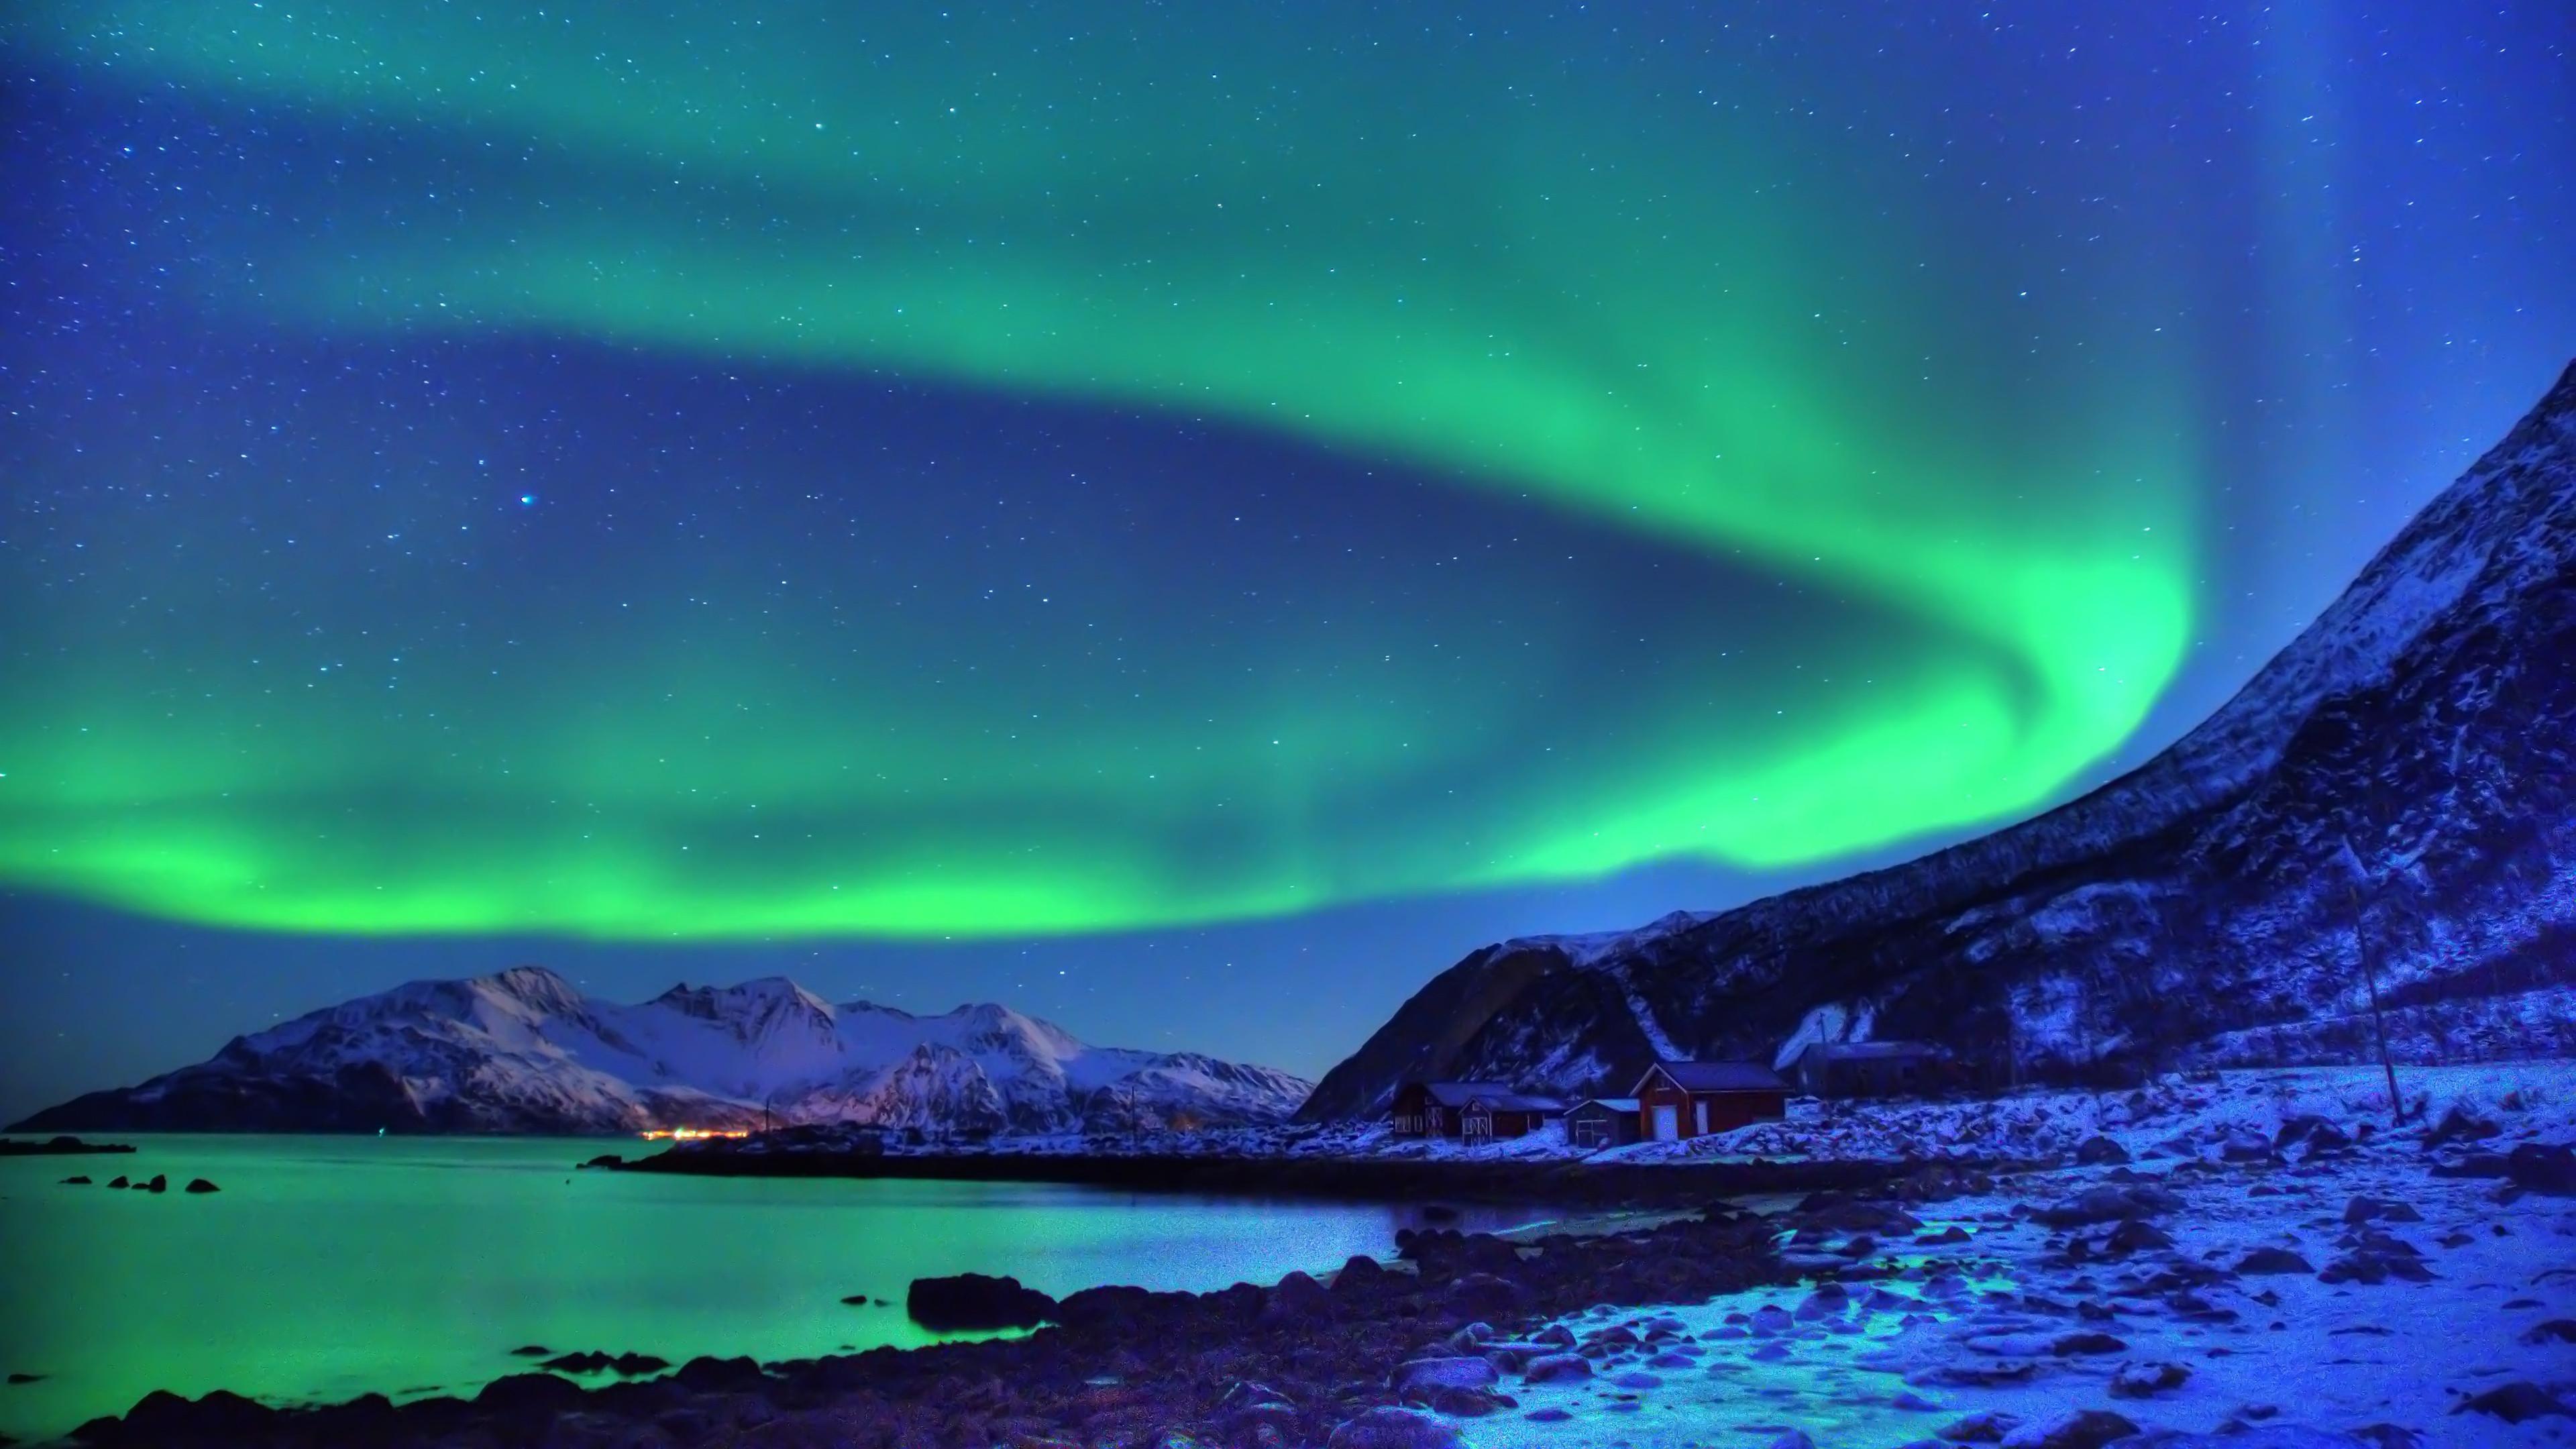 Earth – Aurora Borealis Snow Night Wallpaper